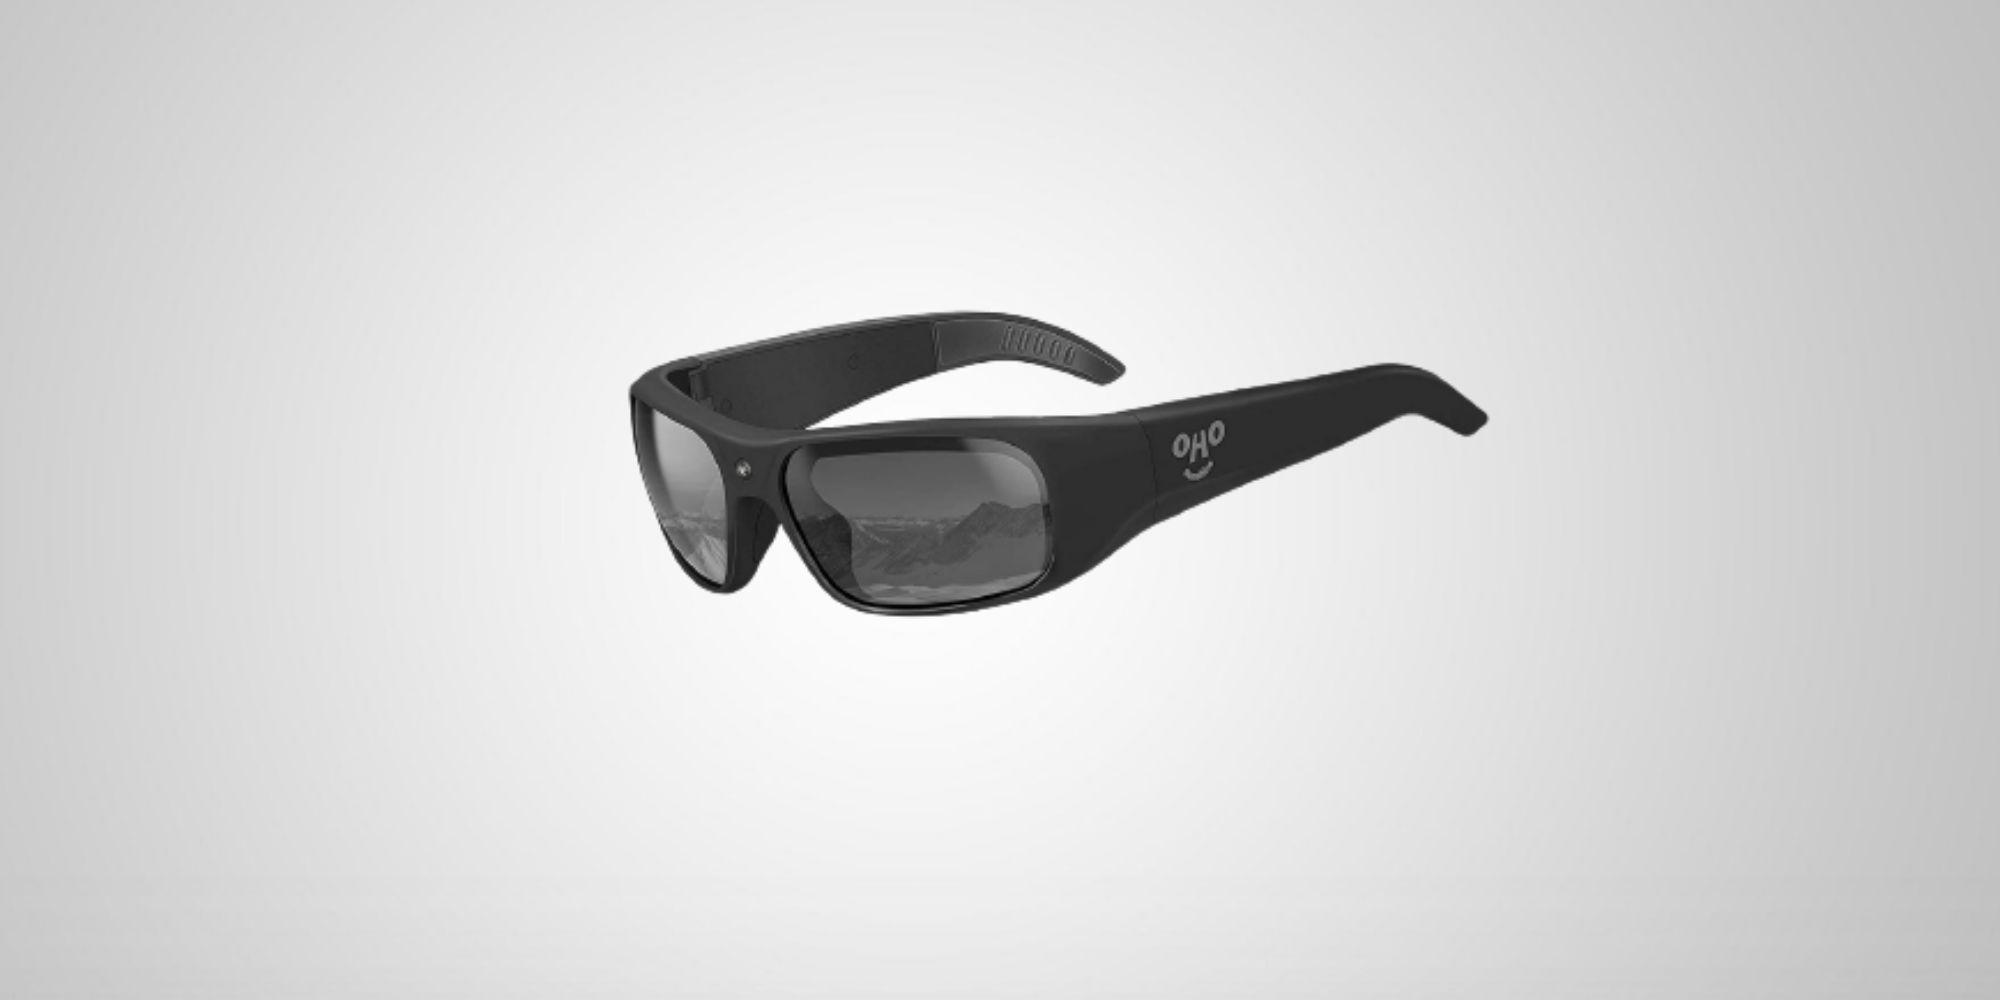 OhO sunshine Waterproof Sunglasses